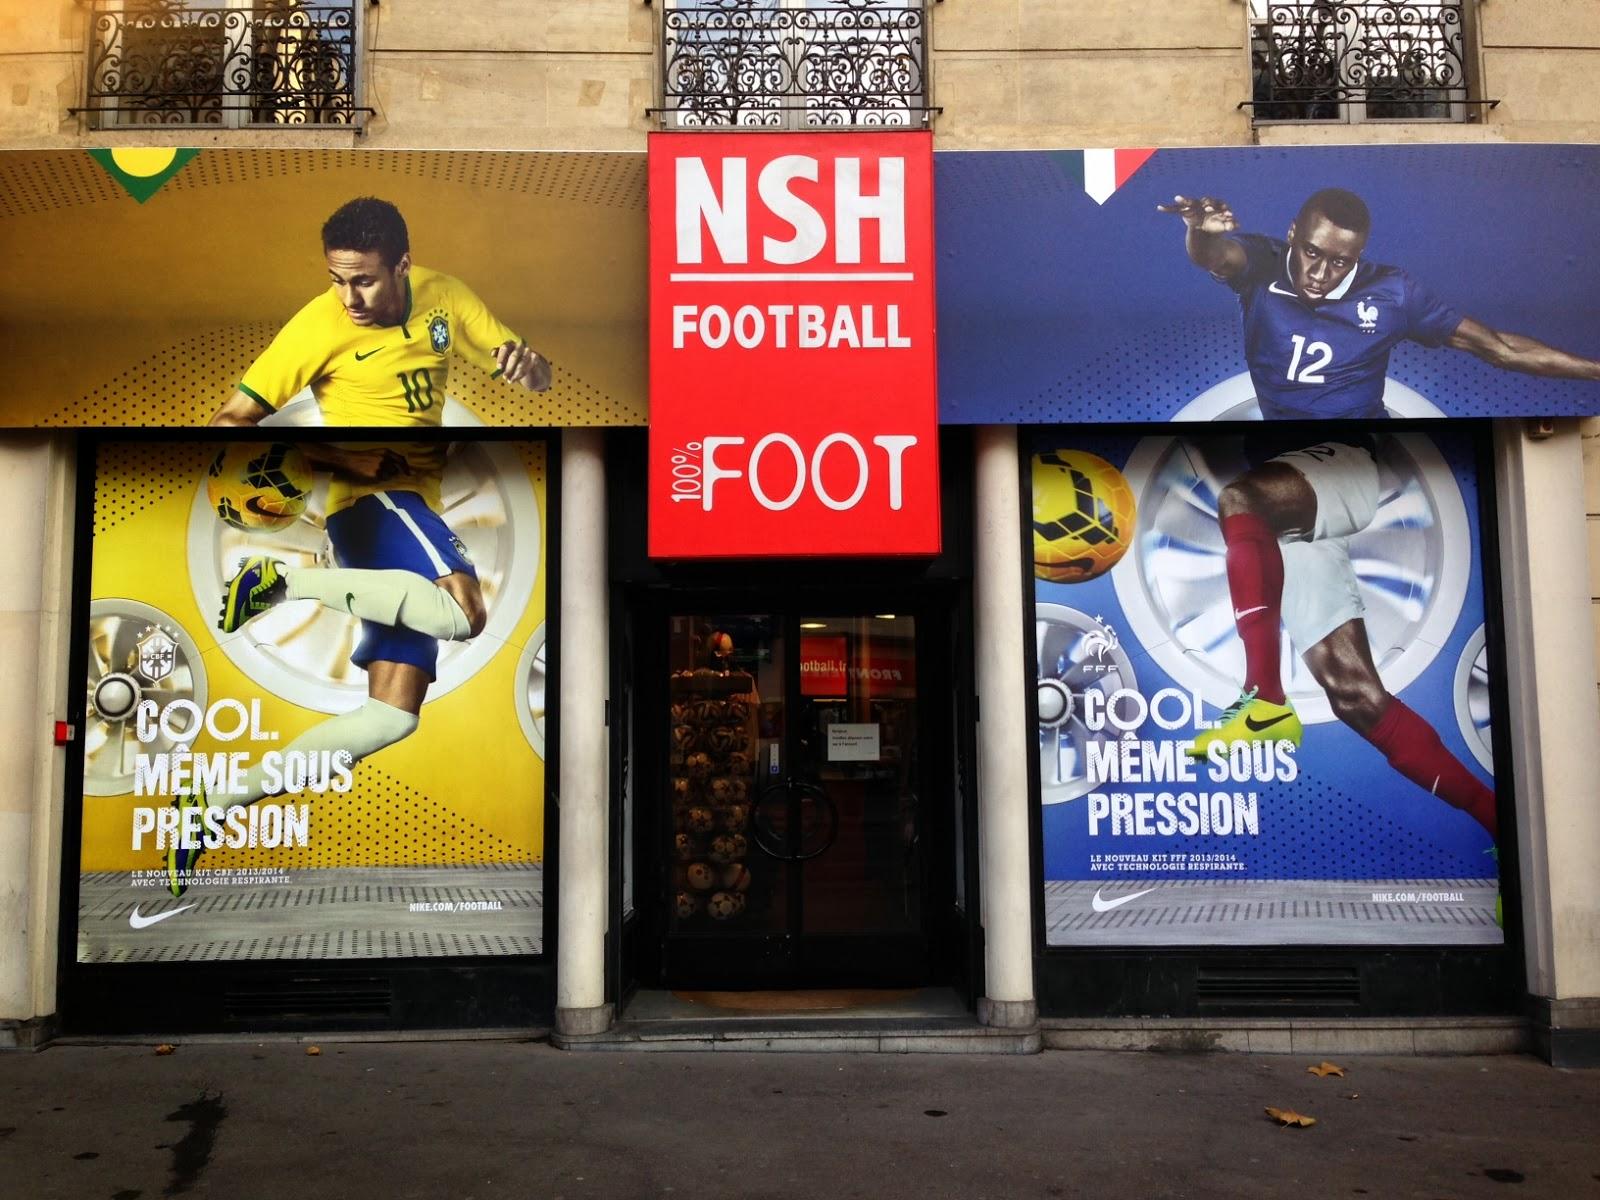 NSH FOOTBALL